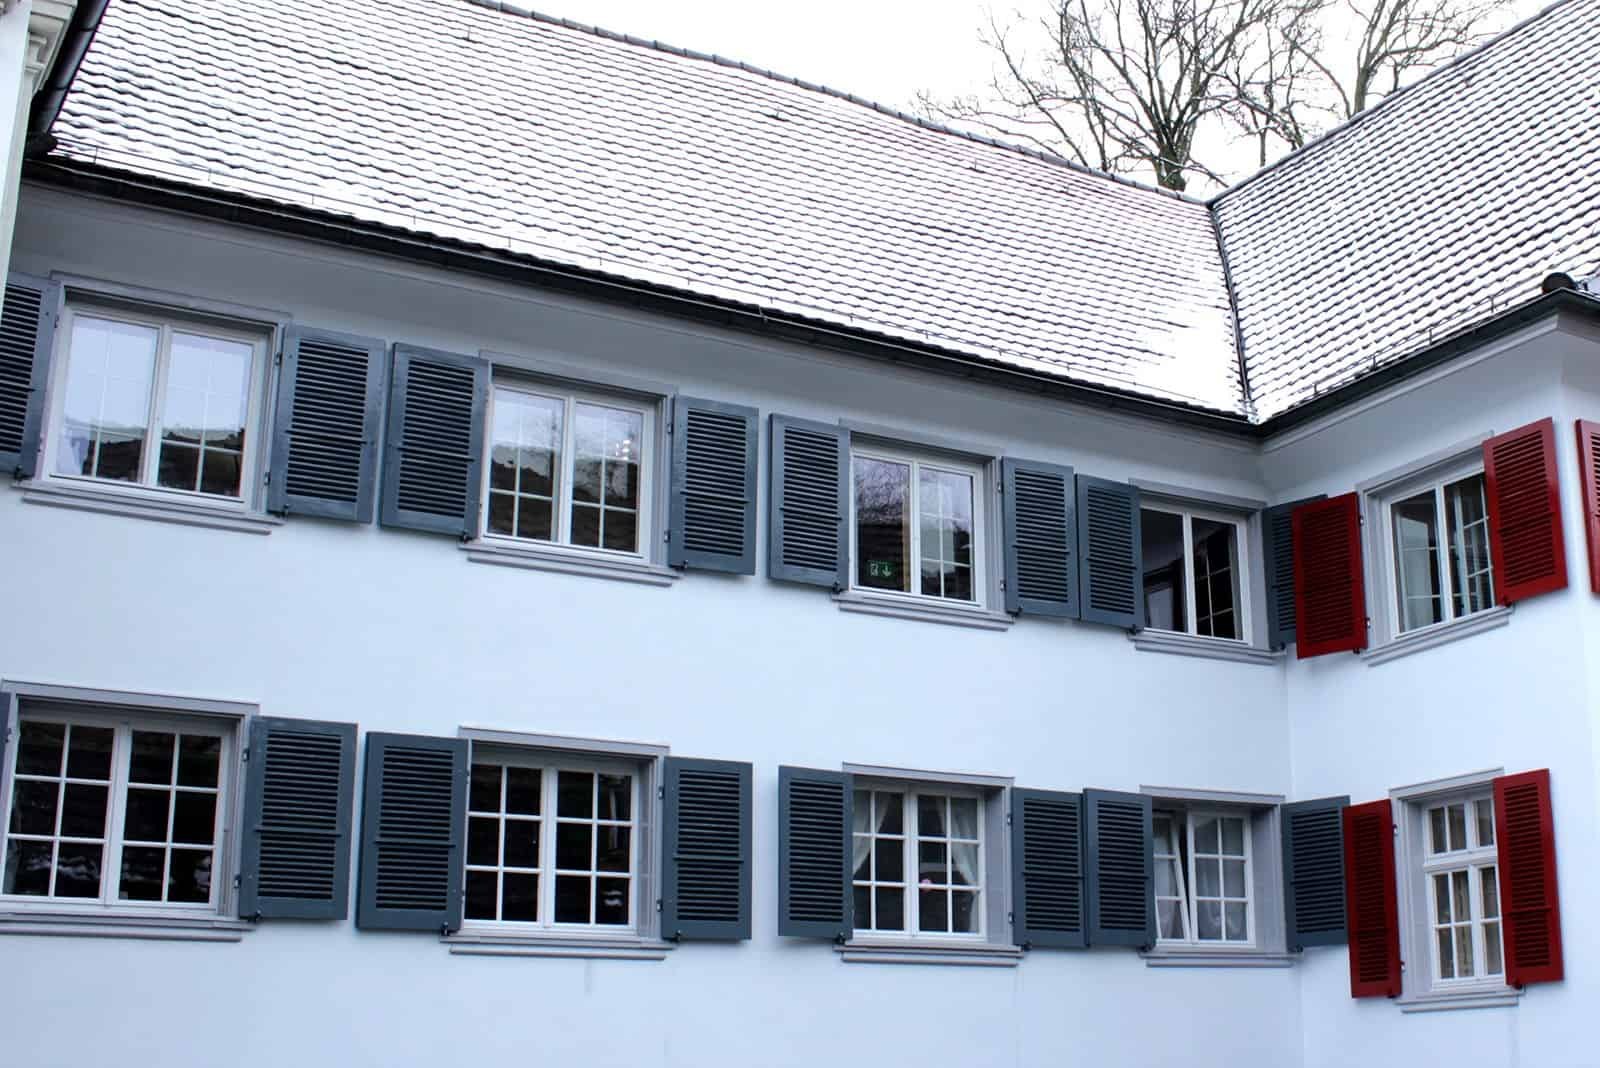 museum rosenegg b renstrasse 6 kreuzlingen historfen historische fenster renovieren. Black Bedroom Furniture Sets. Home Design Ideas